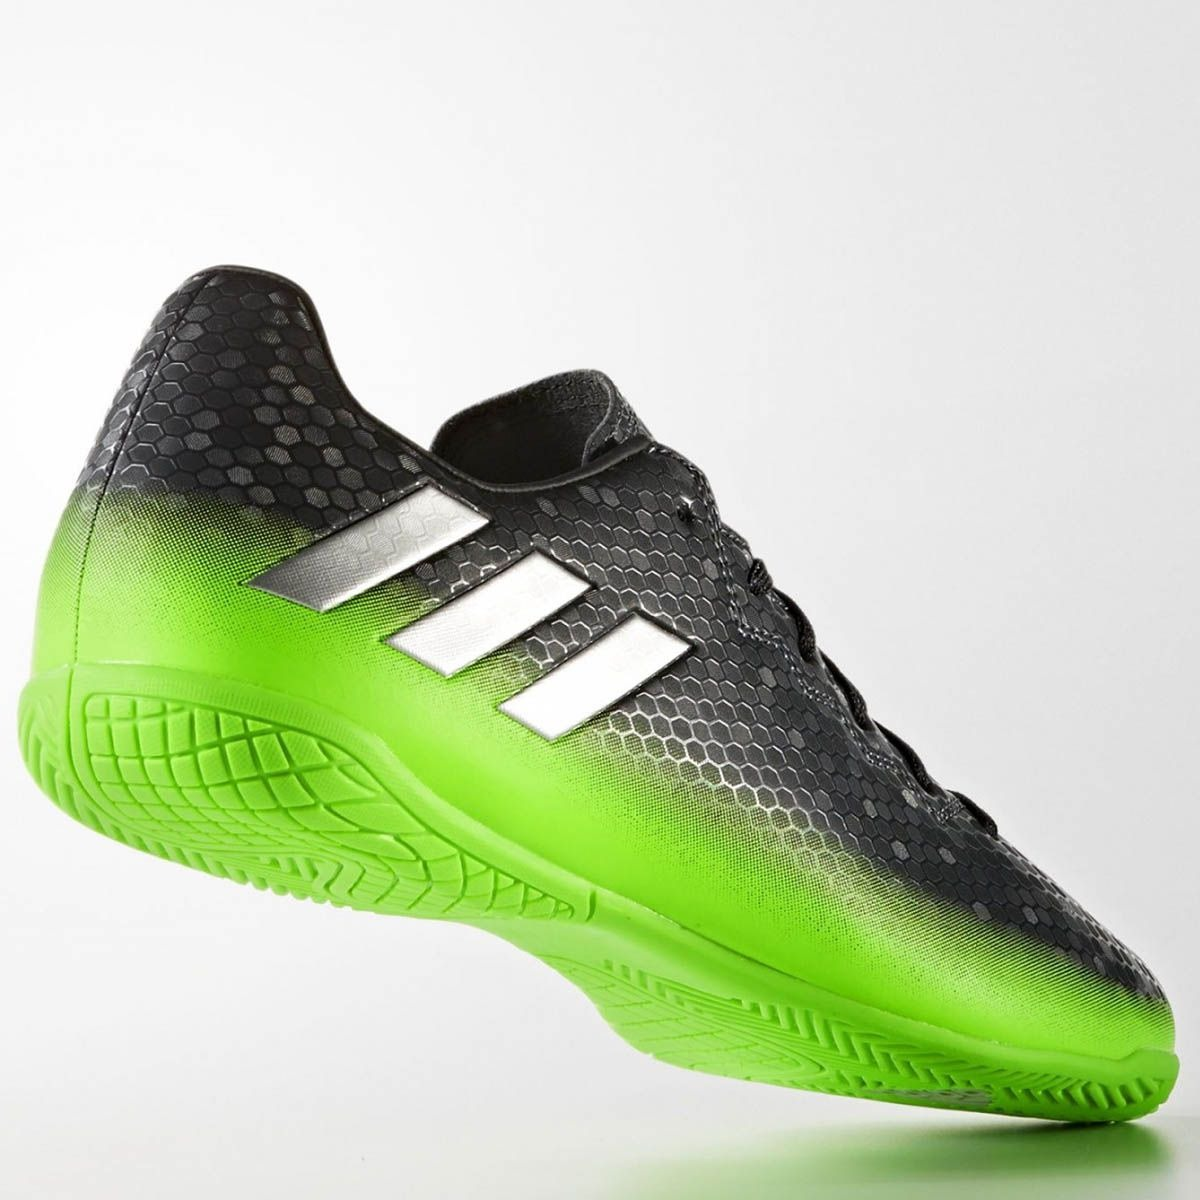 a816de94111f3 Tênis De Futsal Chuteira adidas Messi 16.4 In Original +nf - R$ 209 ...